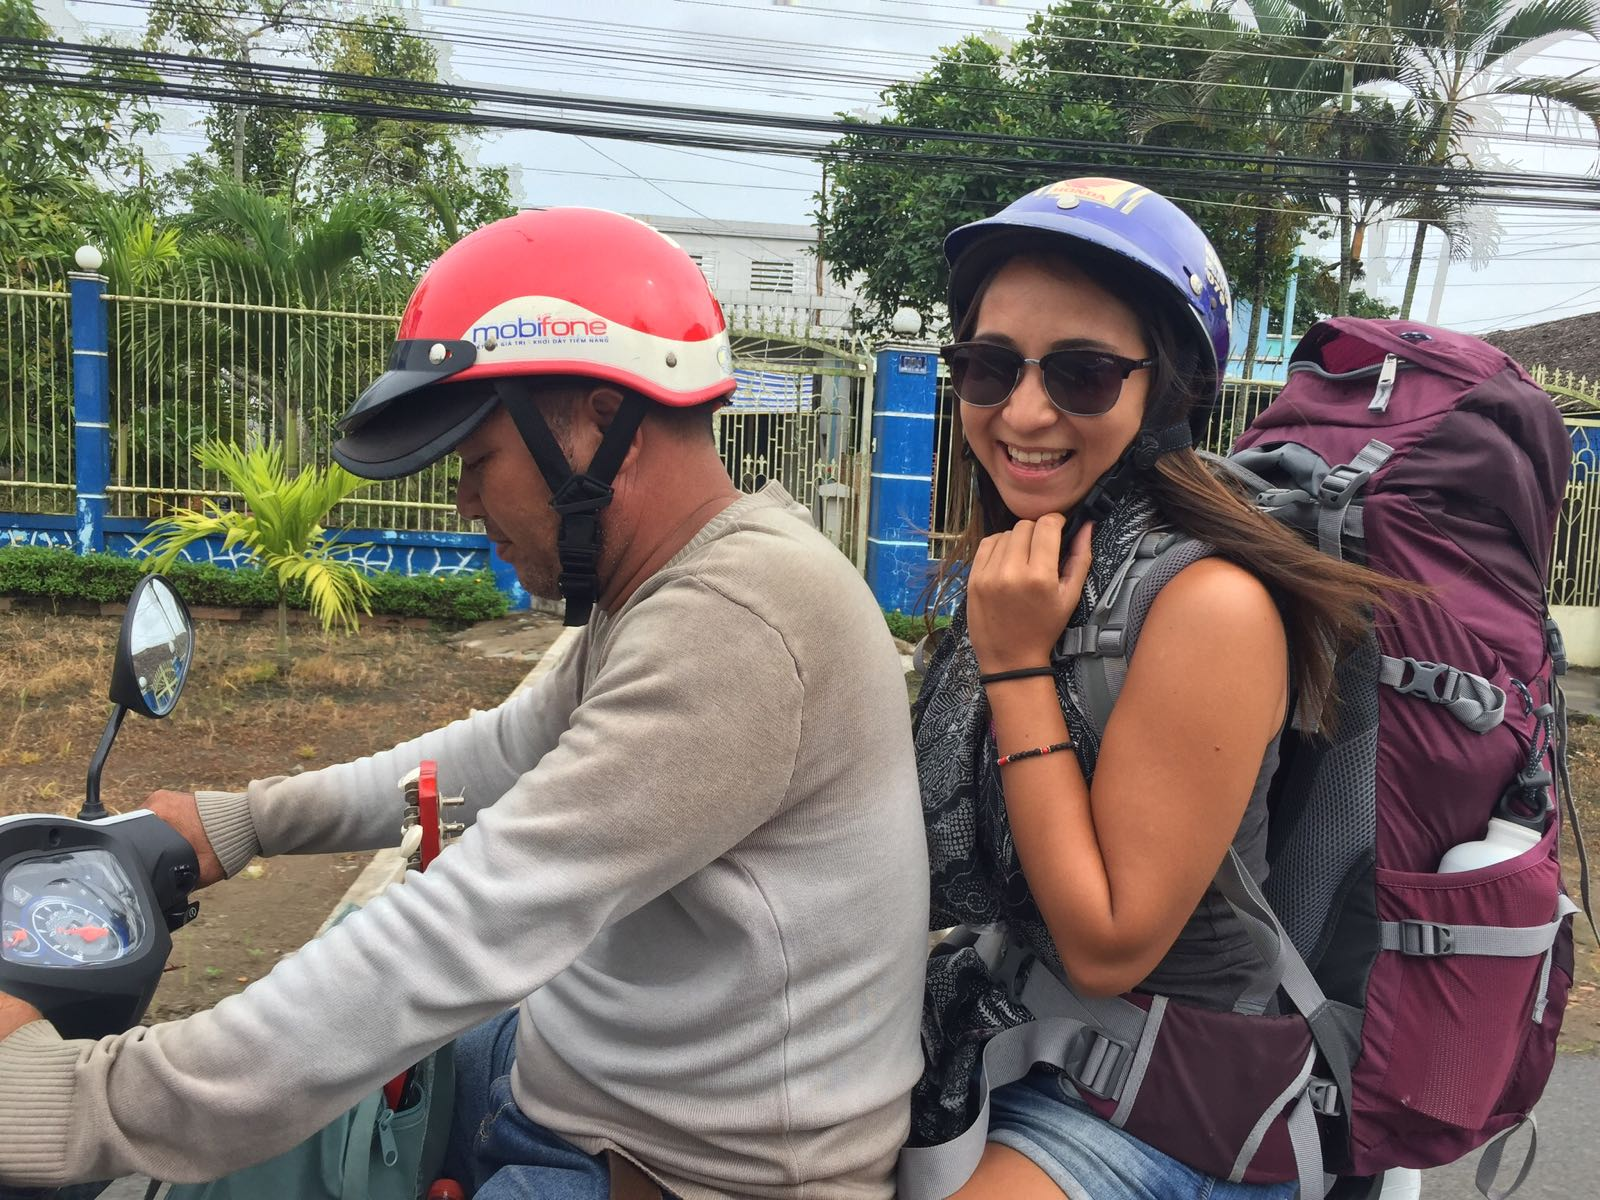 Unser Rollertaxi - wir sind froh um unsere Backpacks